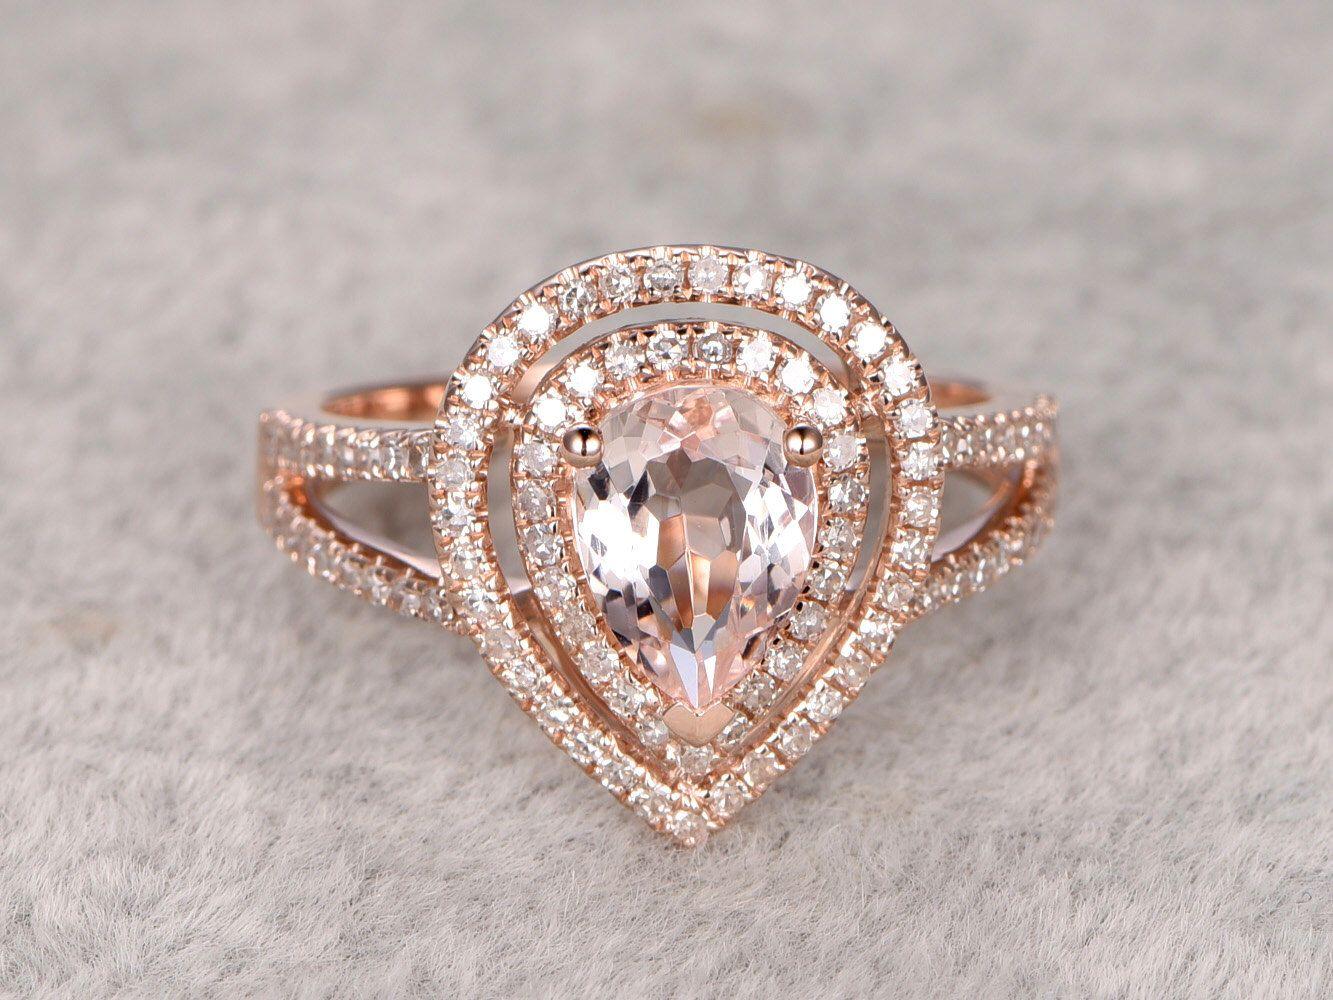 Morganite Engagement Ring Rose Gold,double Halo Diamond Wedding  Band,14k,6x8mm Pear